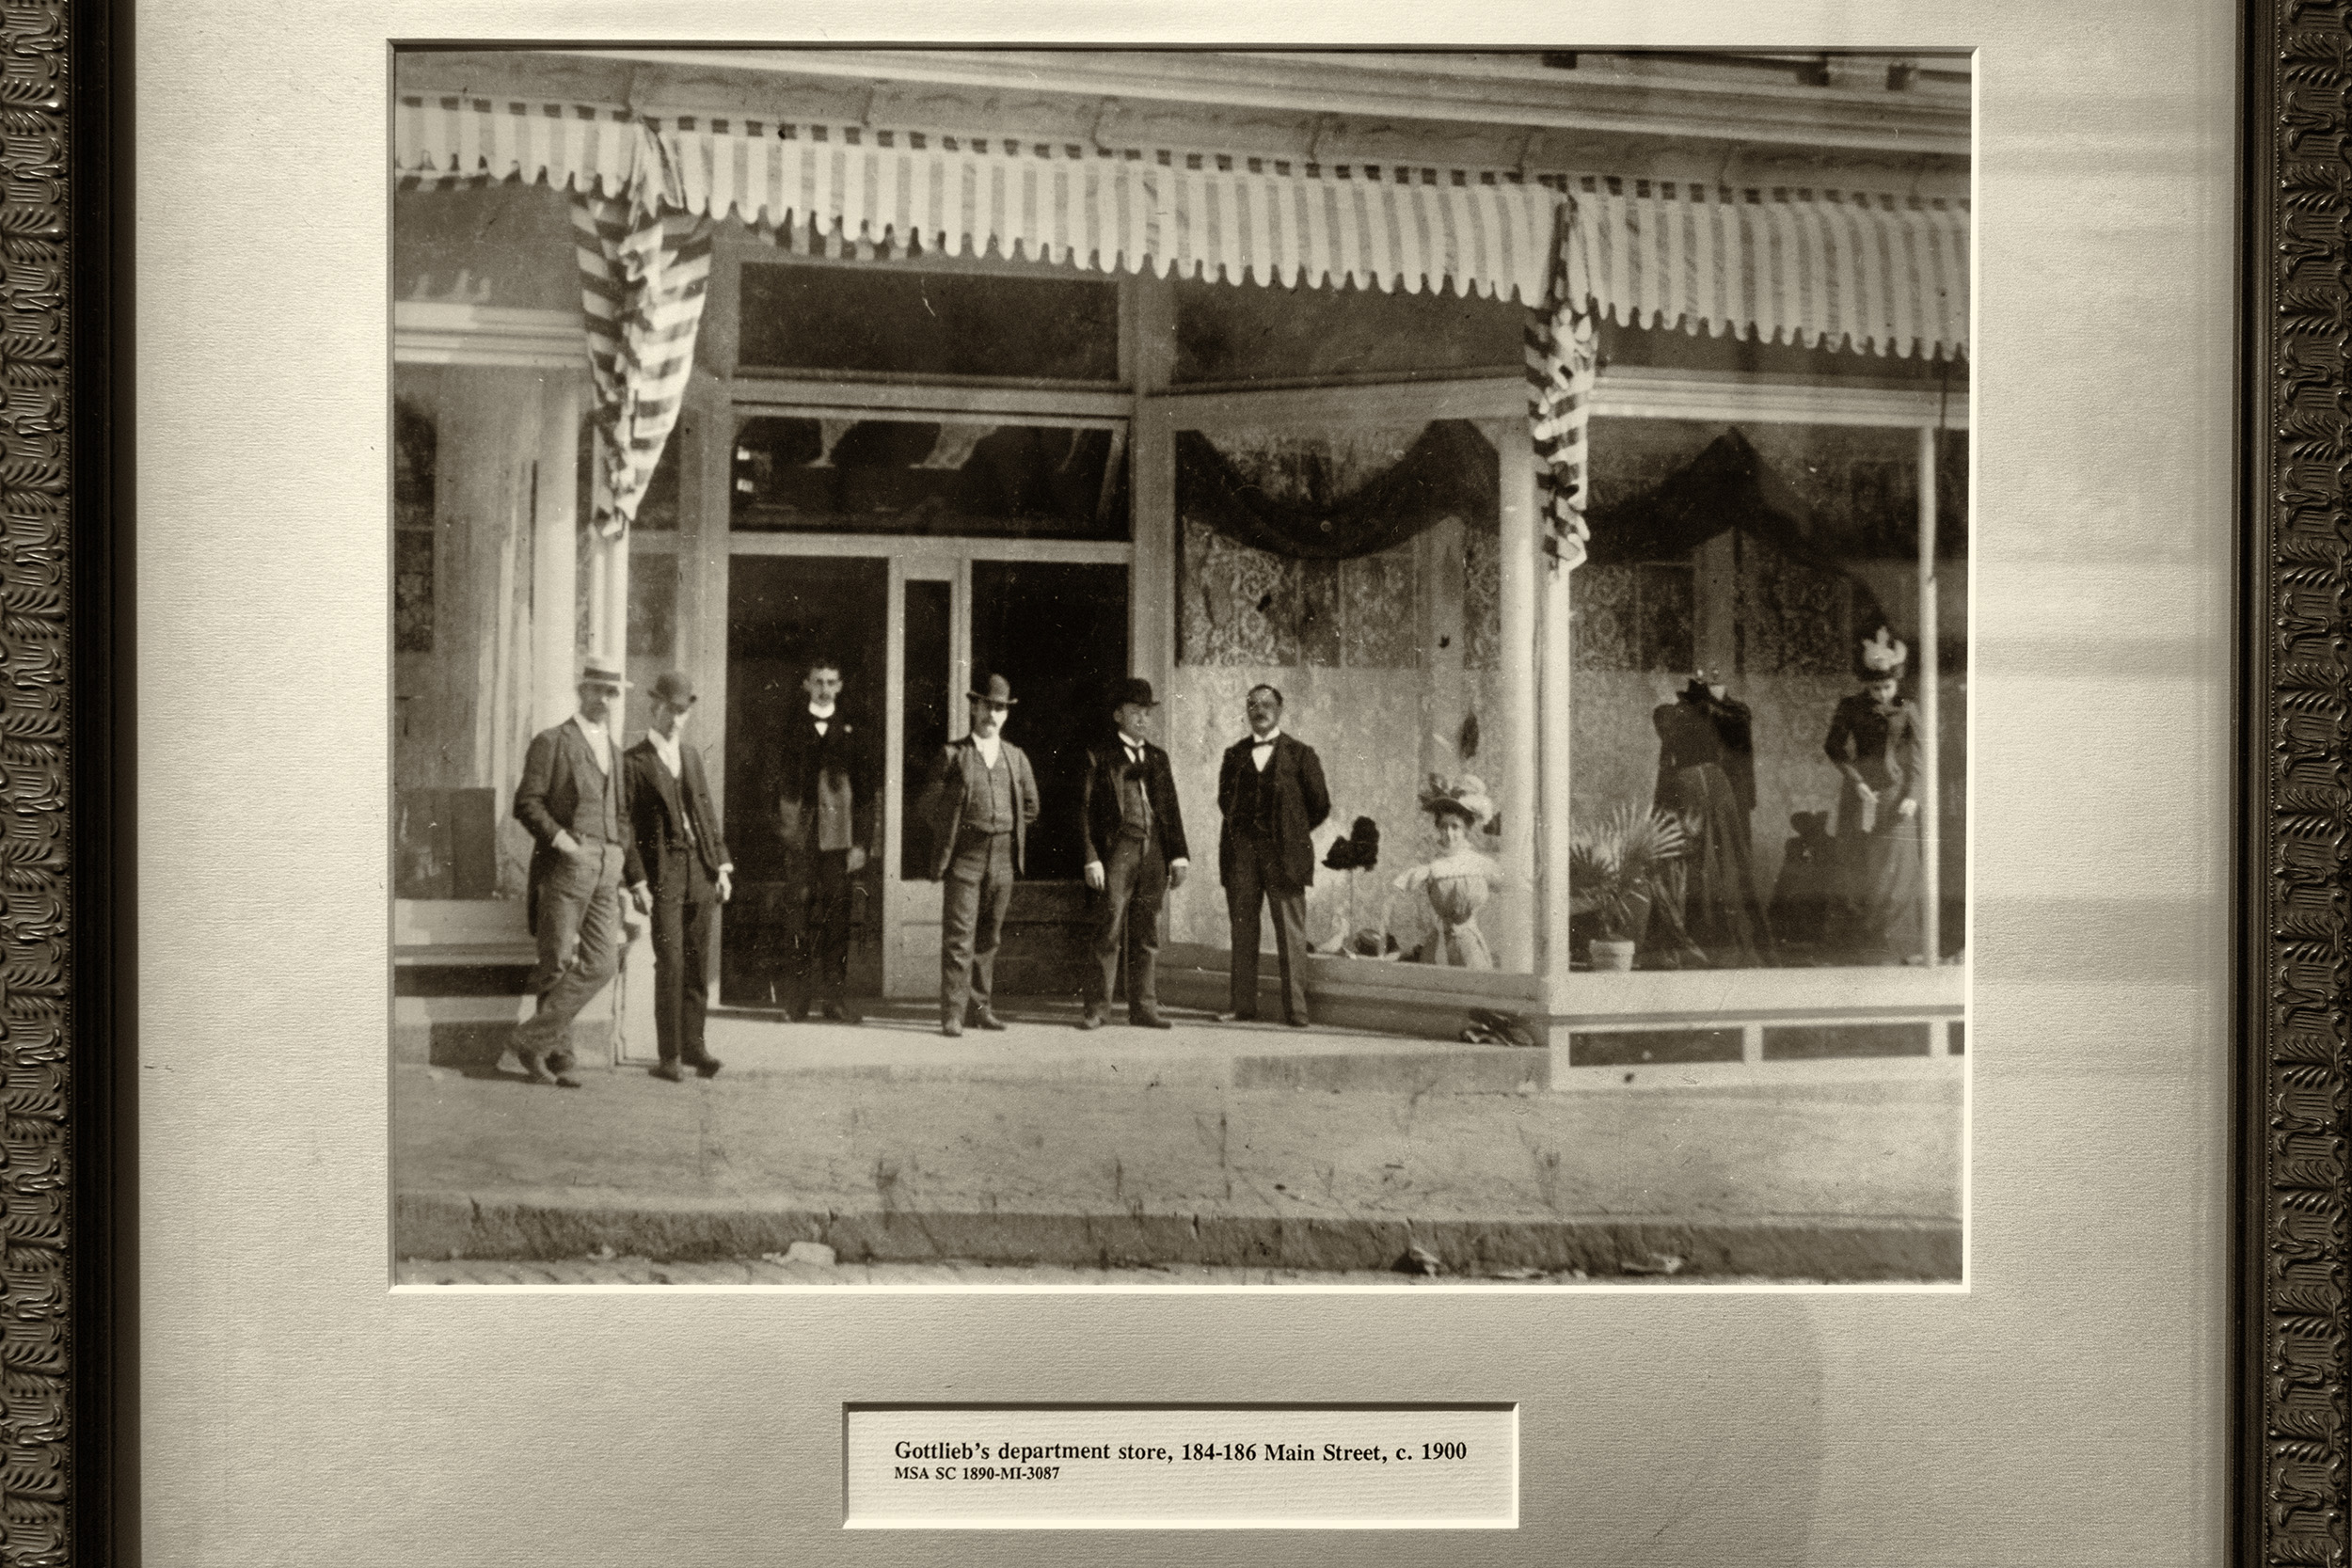 Gottlieb's Department Store